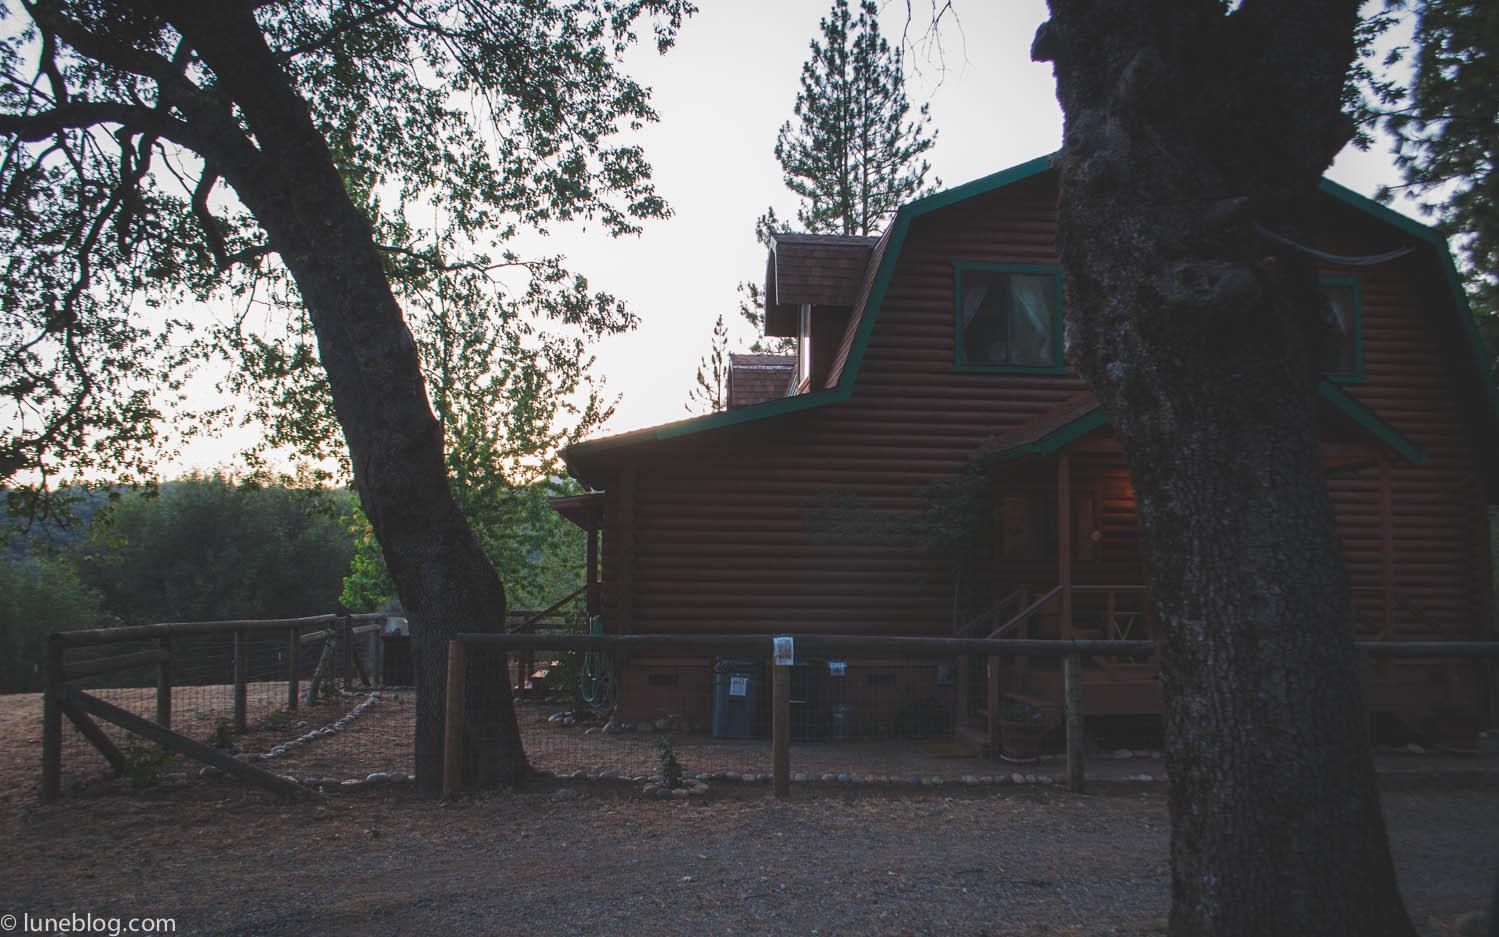 lune blog glamping hub backcountry haven (1 of 38).jpg